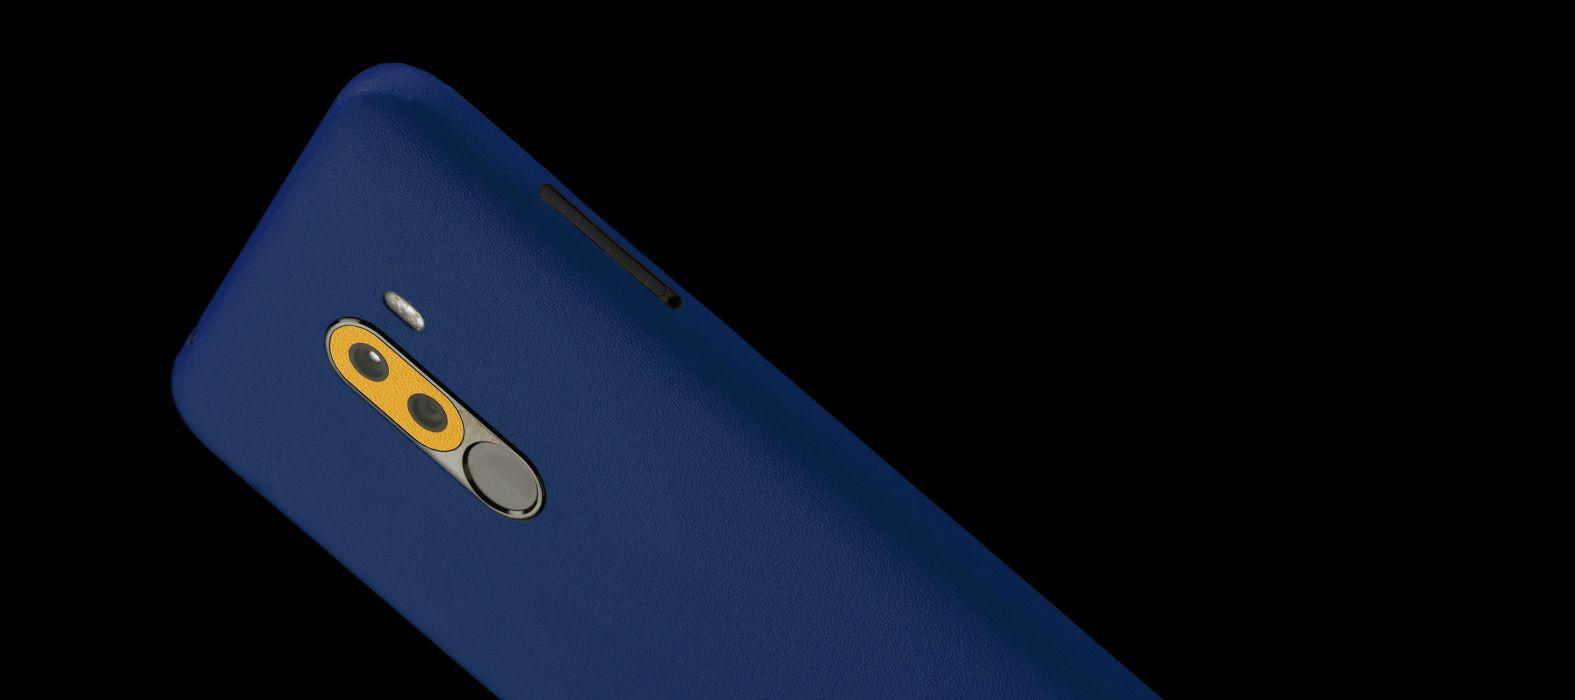 Poco-F1s_Blue-Sandstone_Skins